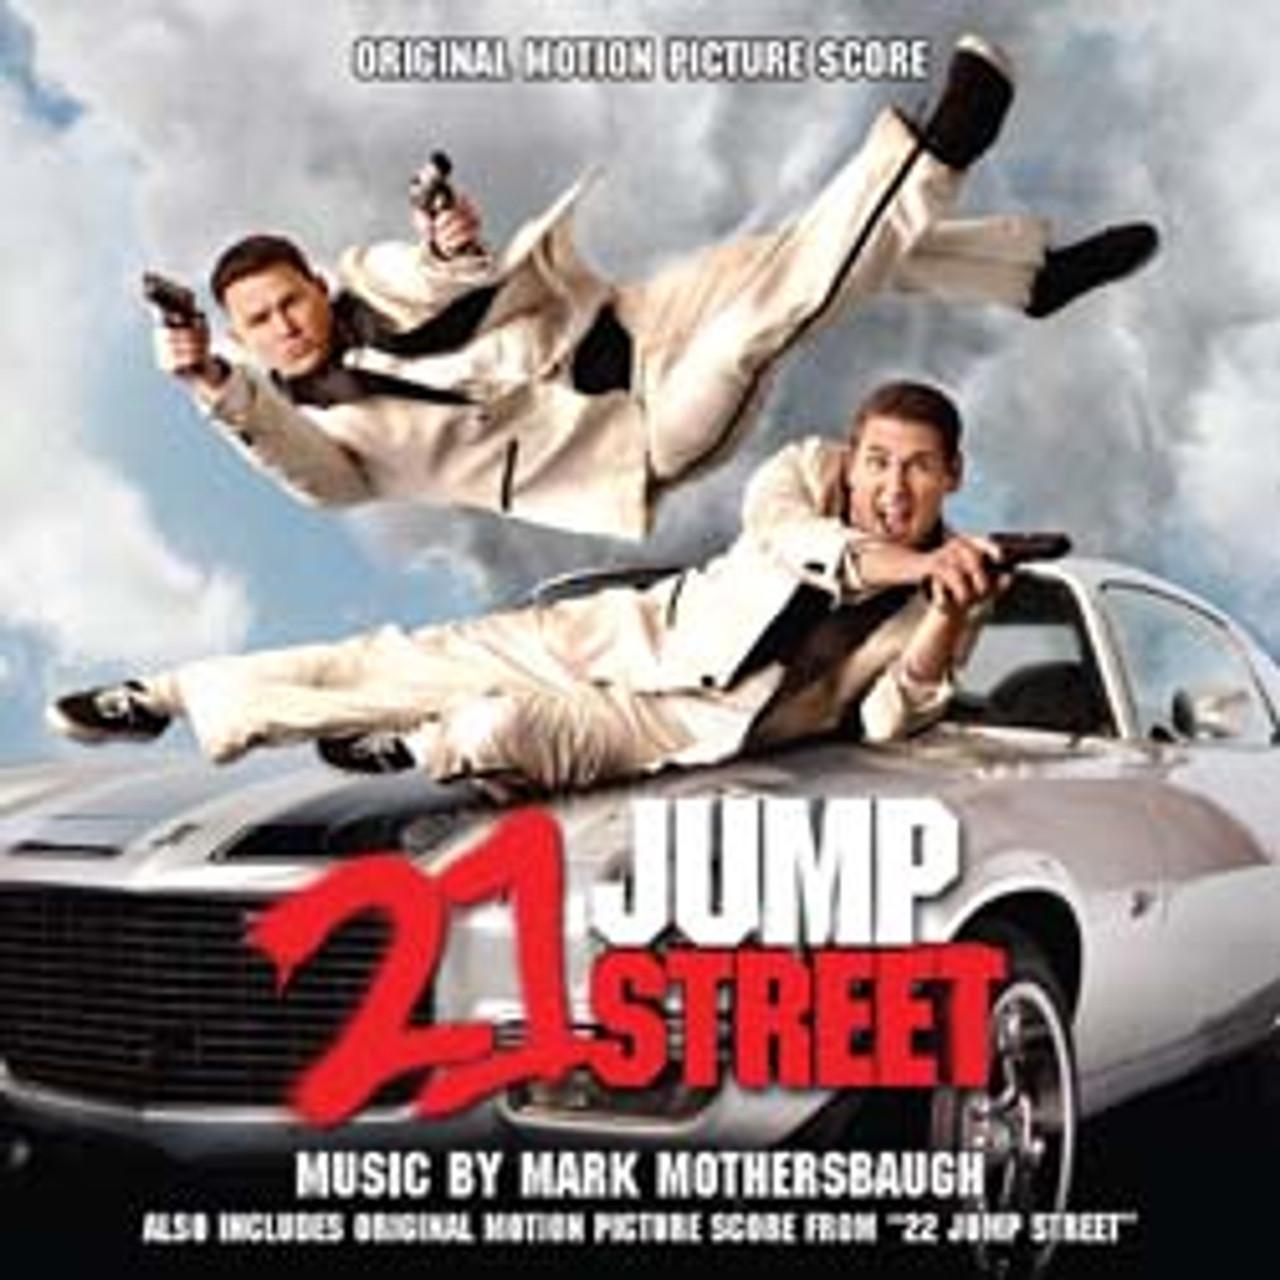 22 & 21 JUMP STREET: LIMITED EDITION (2-CD SET)